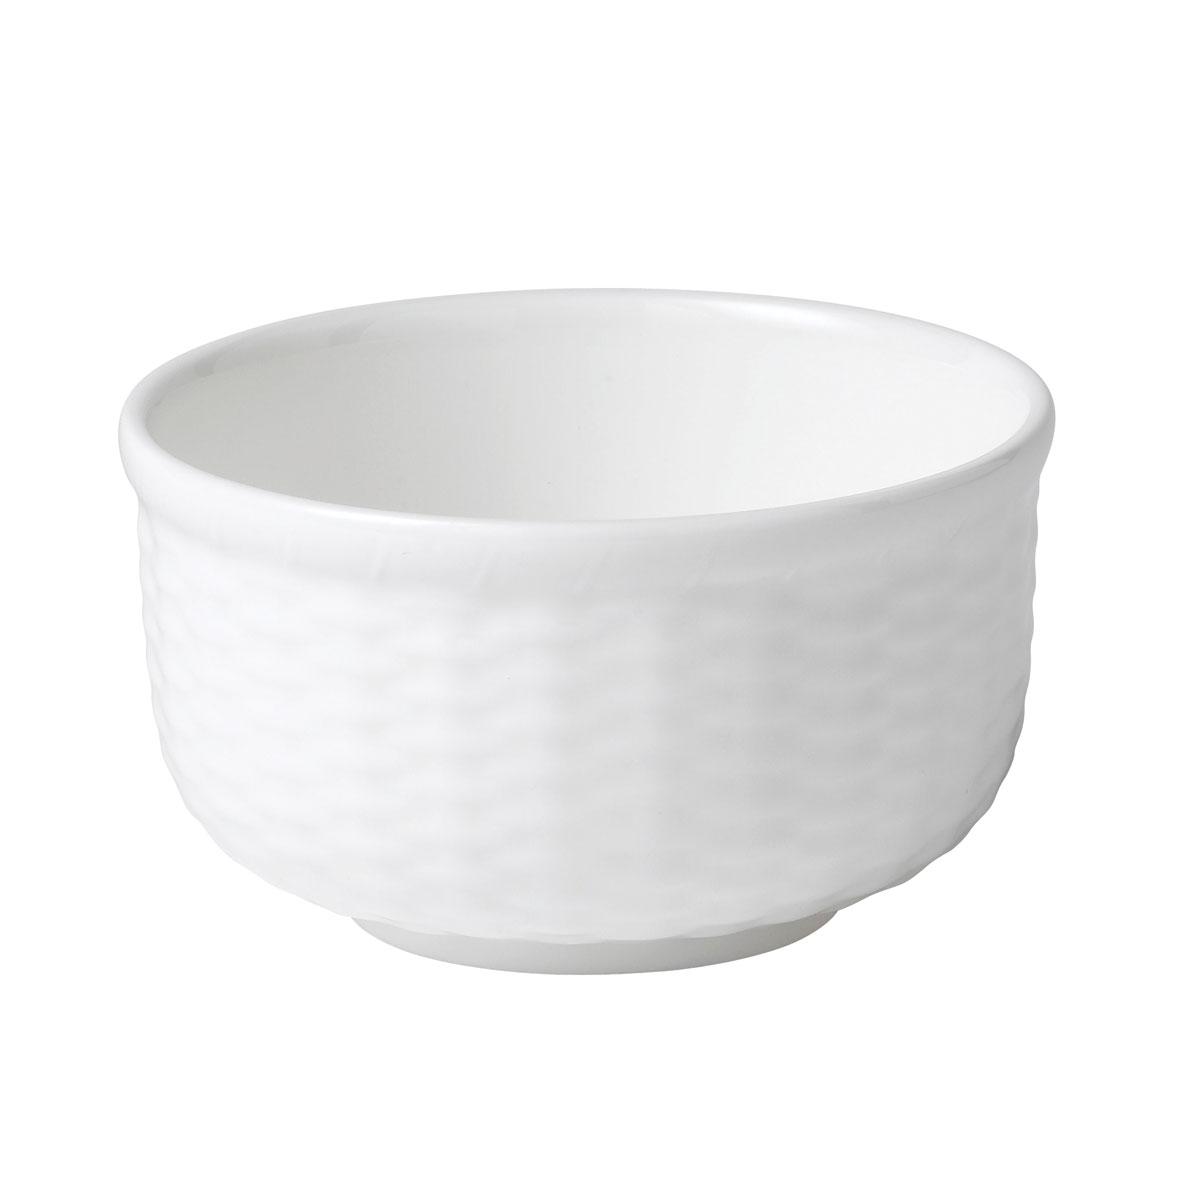 Wedgwood Nantucket Basket Ice Cream Bowl